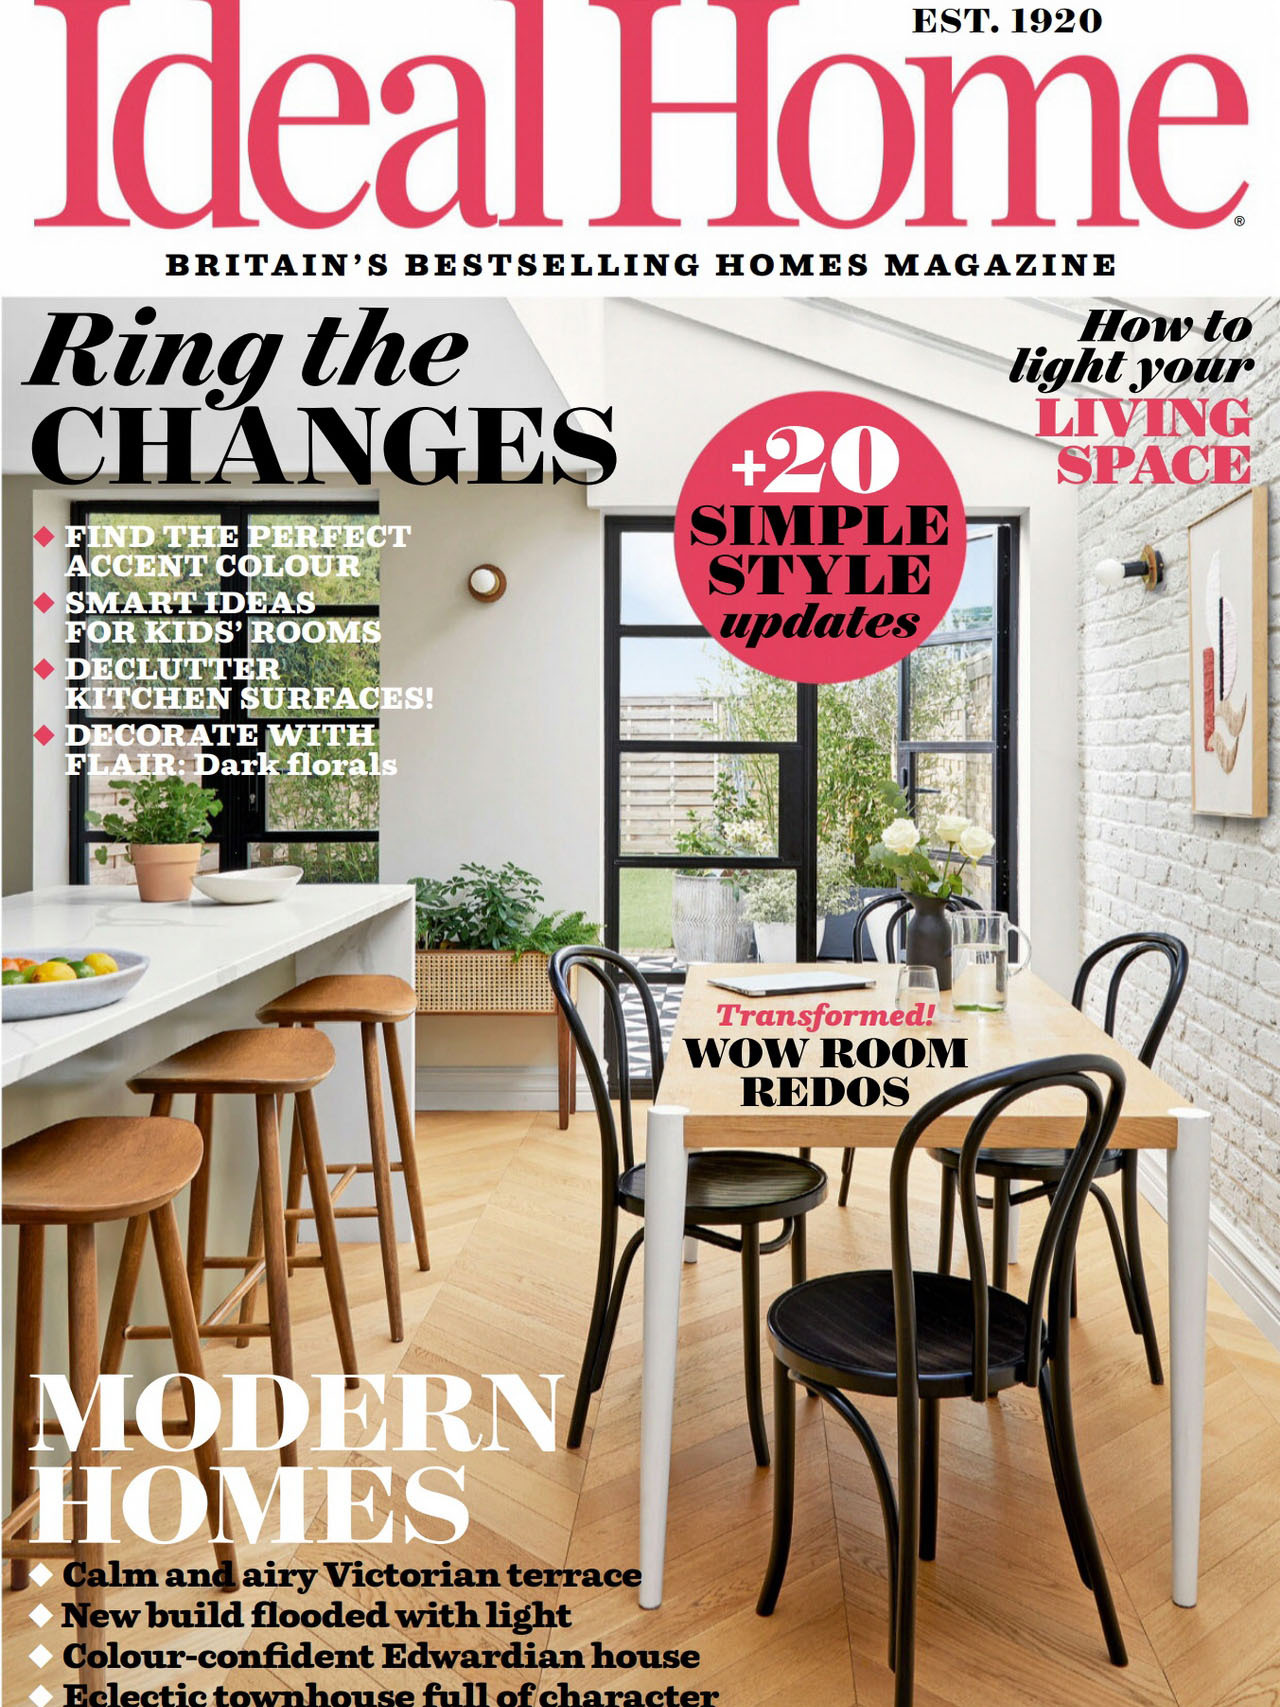 《Ideal Home》英国版理想的家园杂志2021年10月号